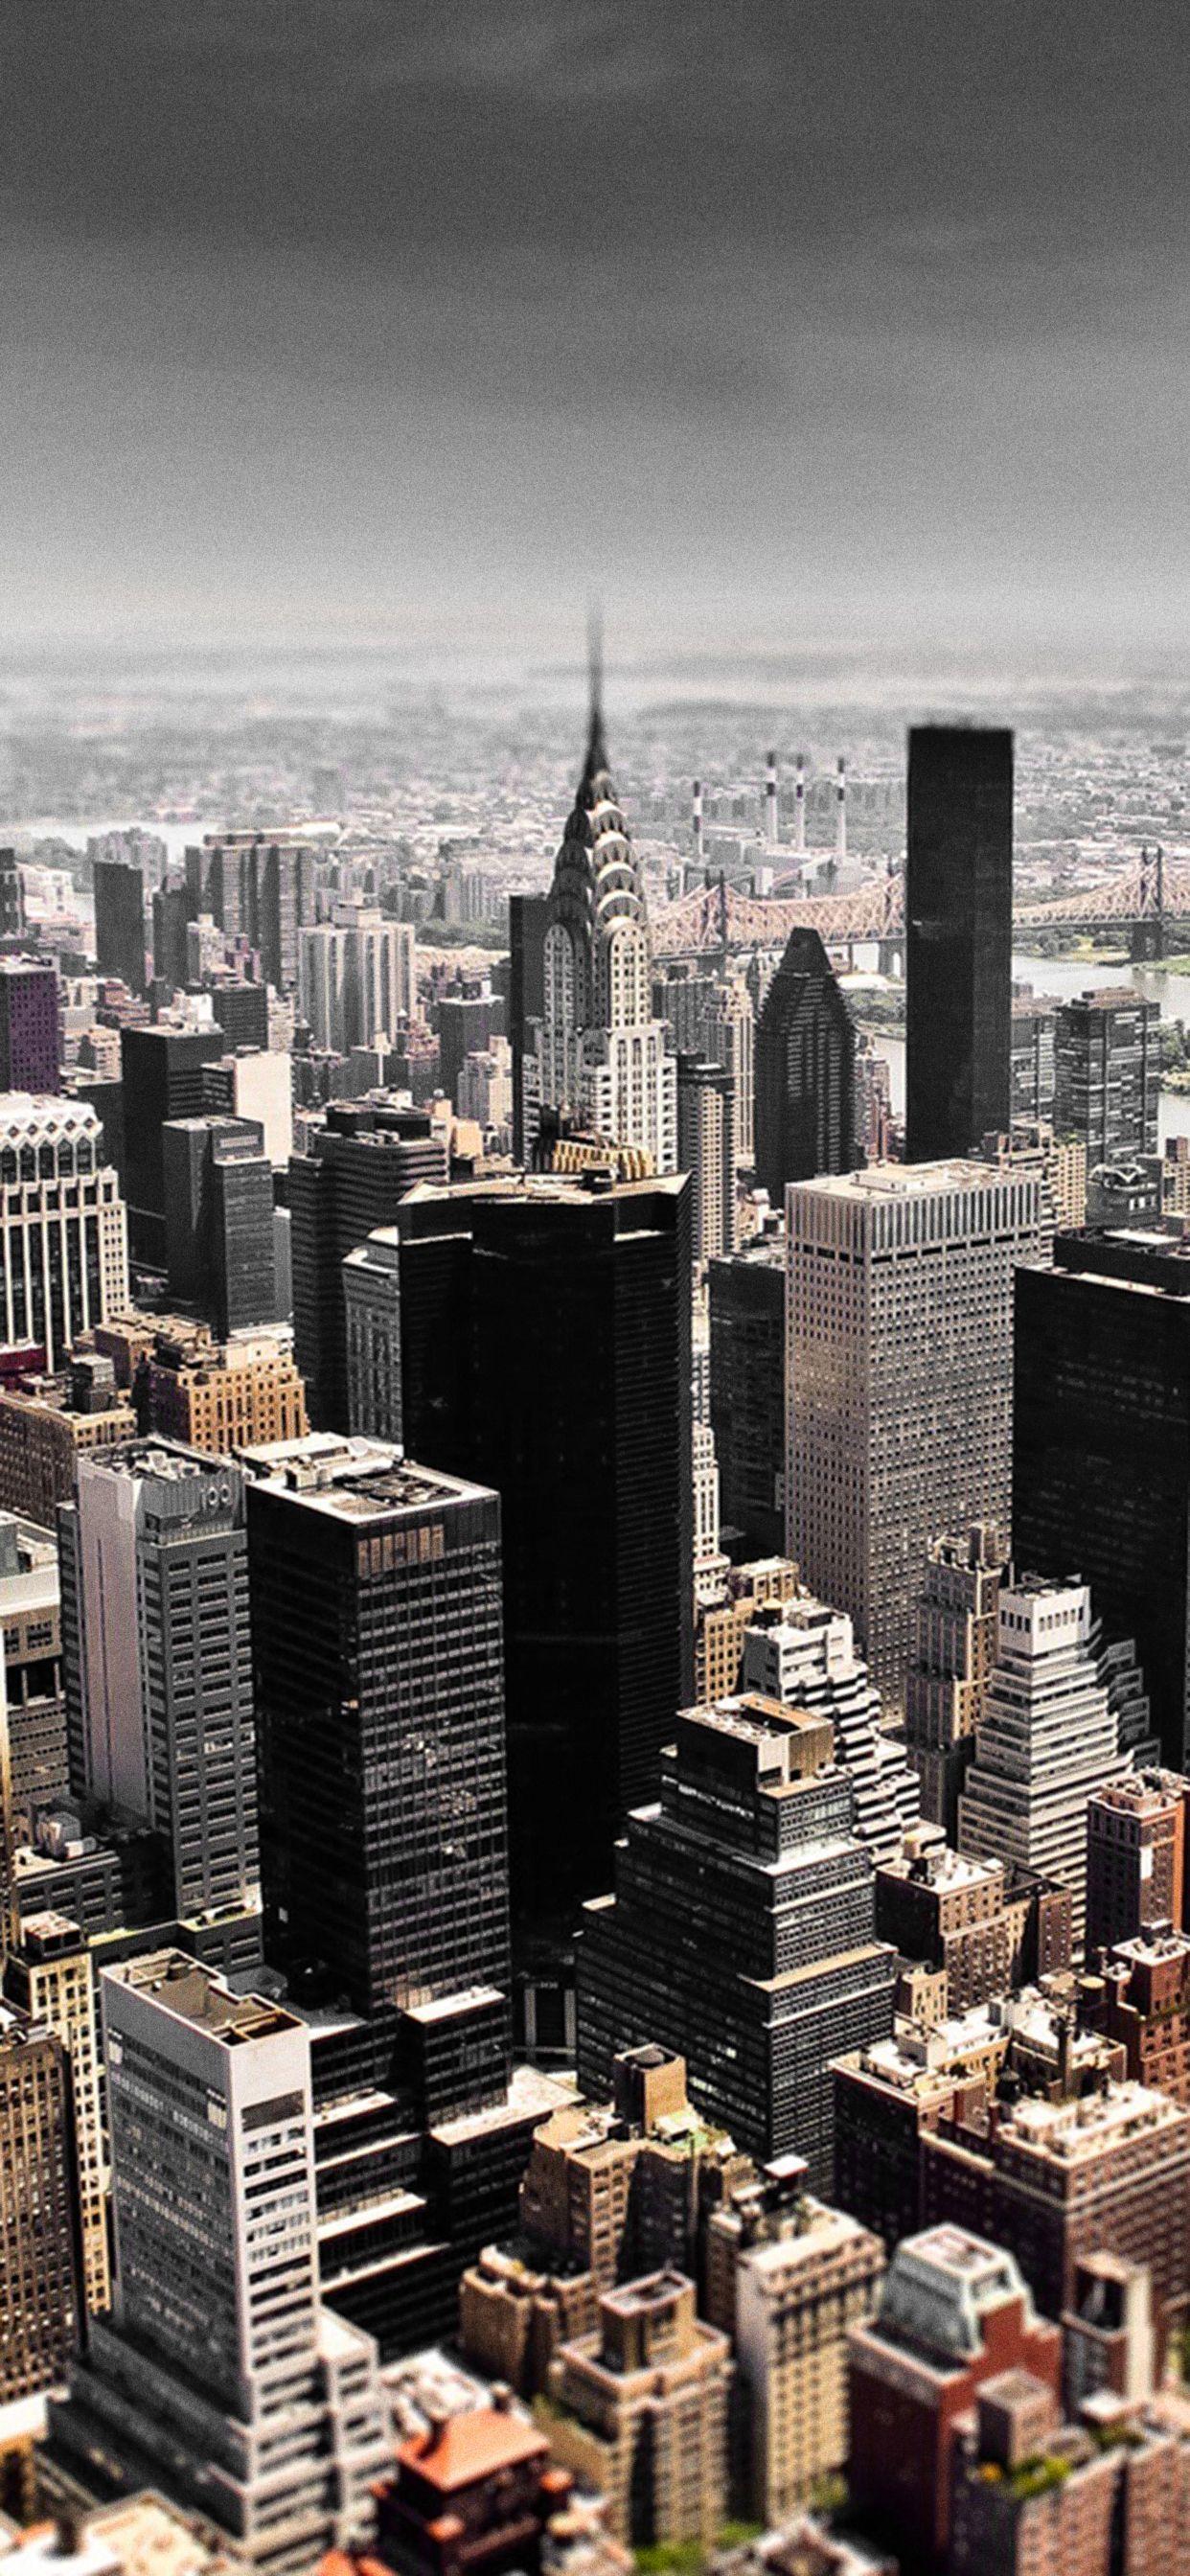 Iphone 11 Pro Wallpaper New York Iphone Wallpaper City Iphone Wallpaper New York Wallpaper